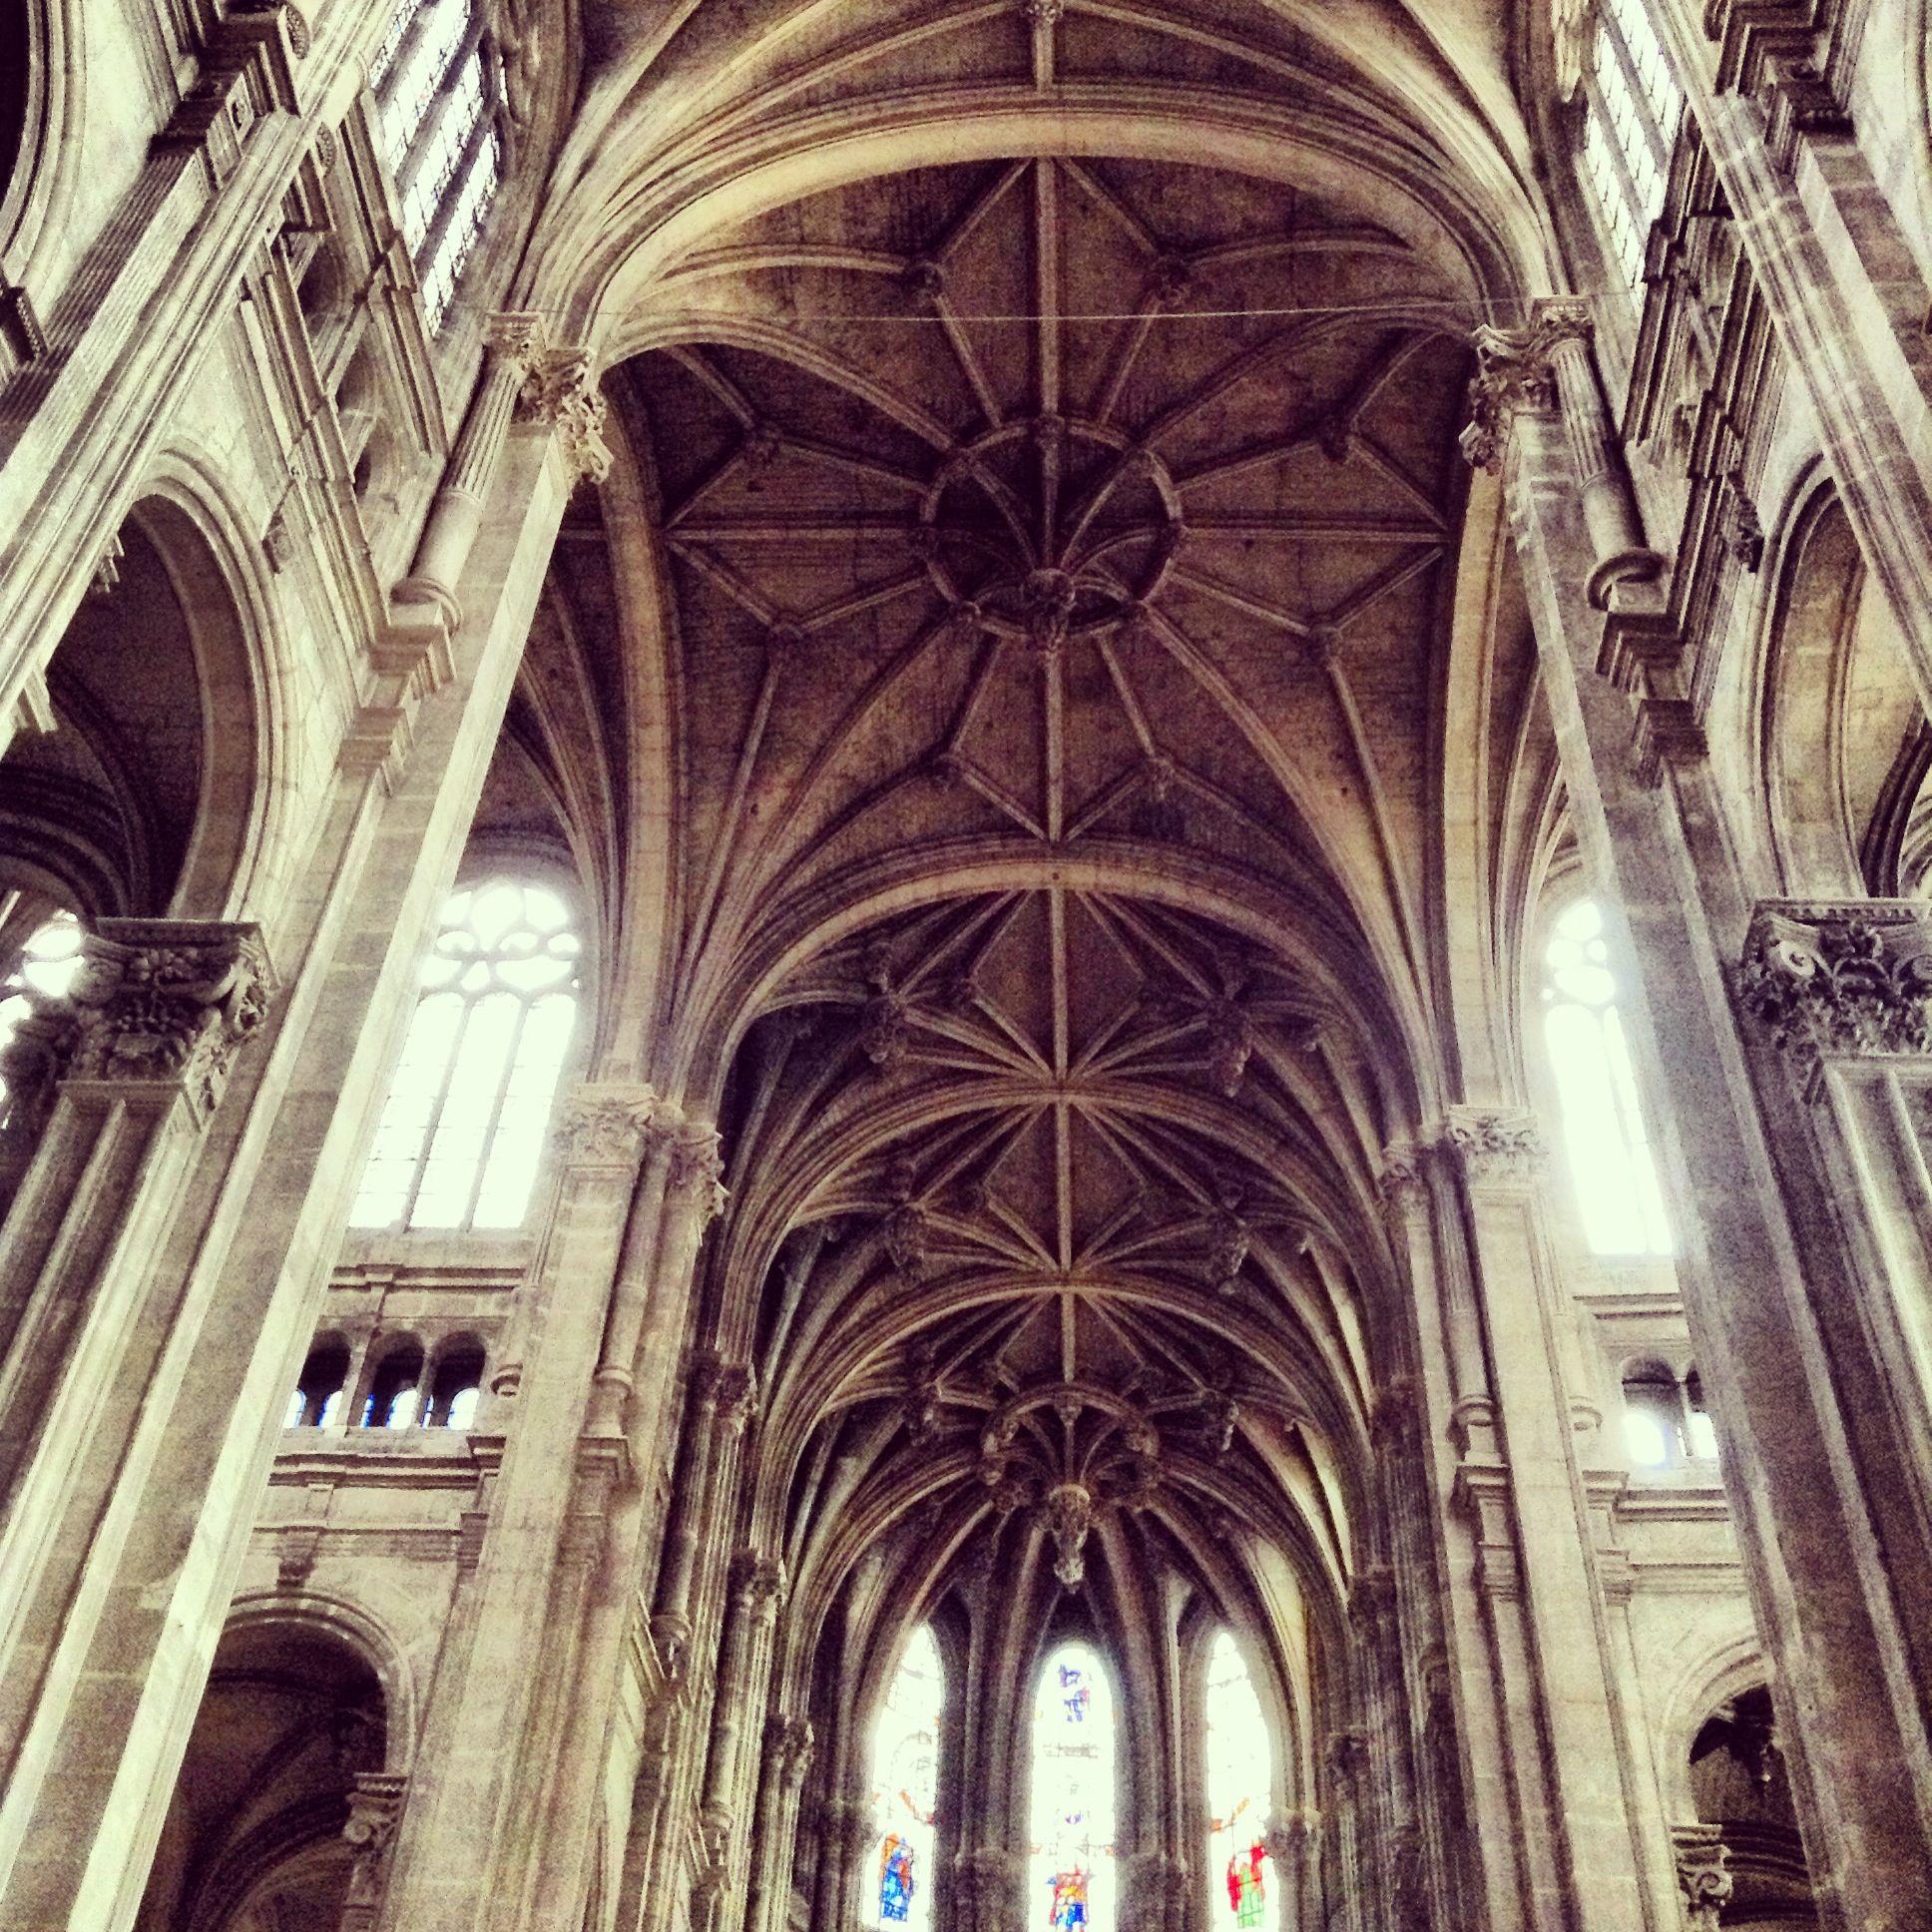 Eglise Saint-Eusache, Paris